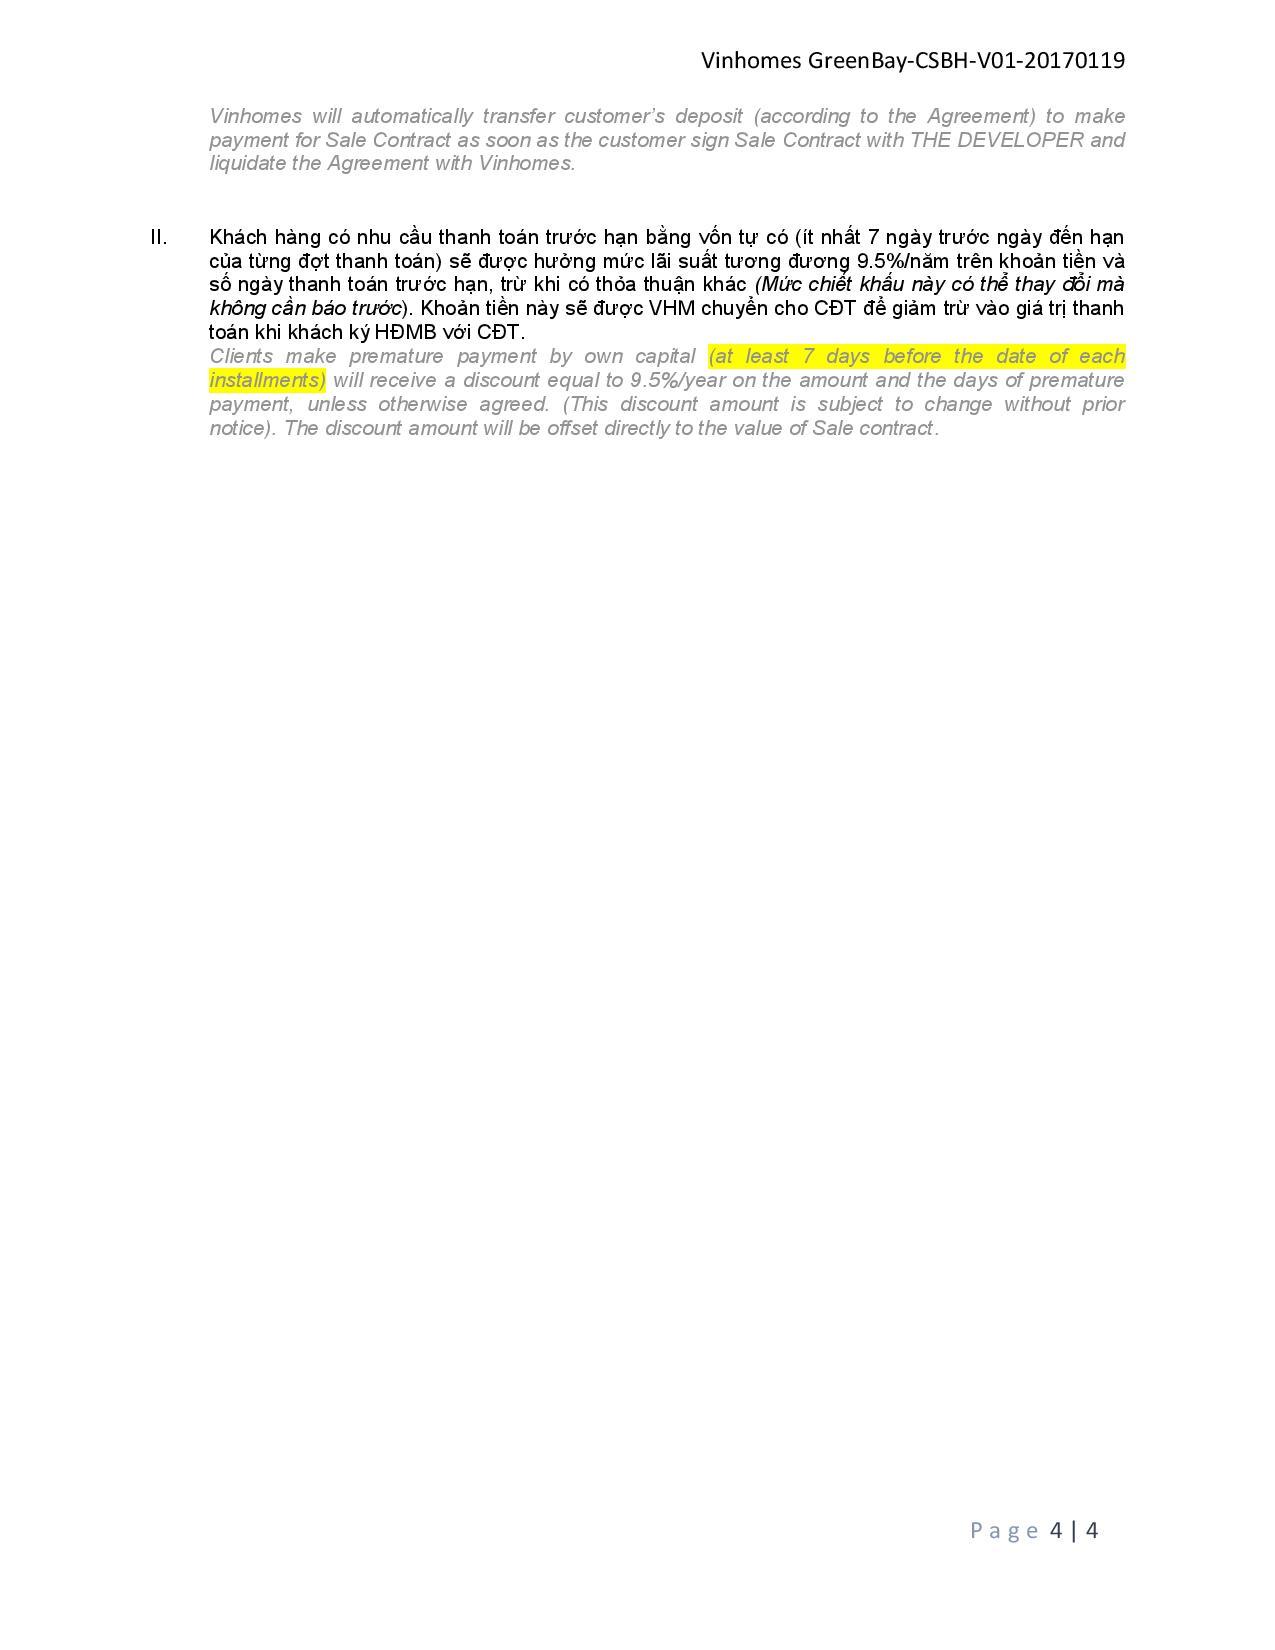 170116-GreenBay-Canho-CS dat coc_final-page-004